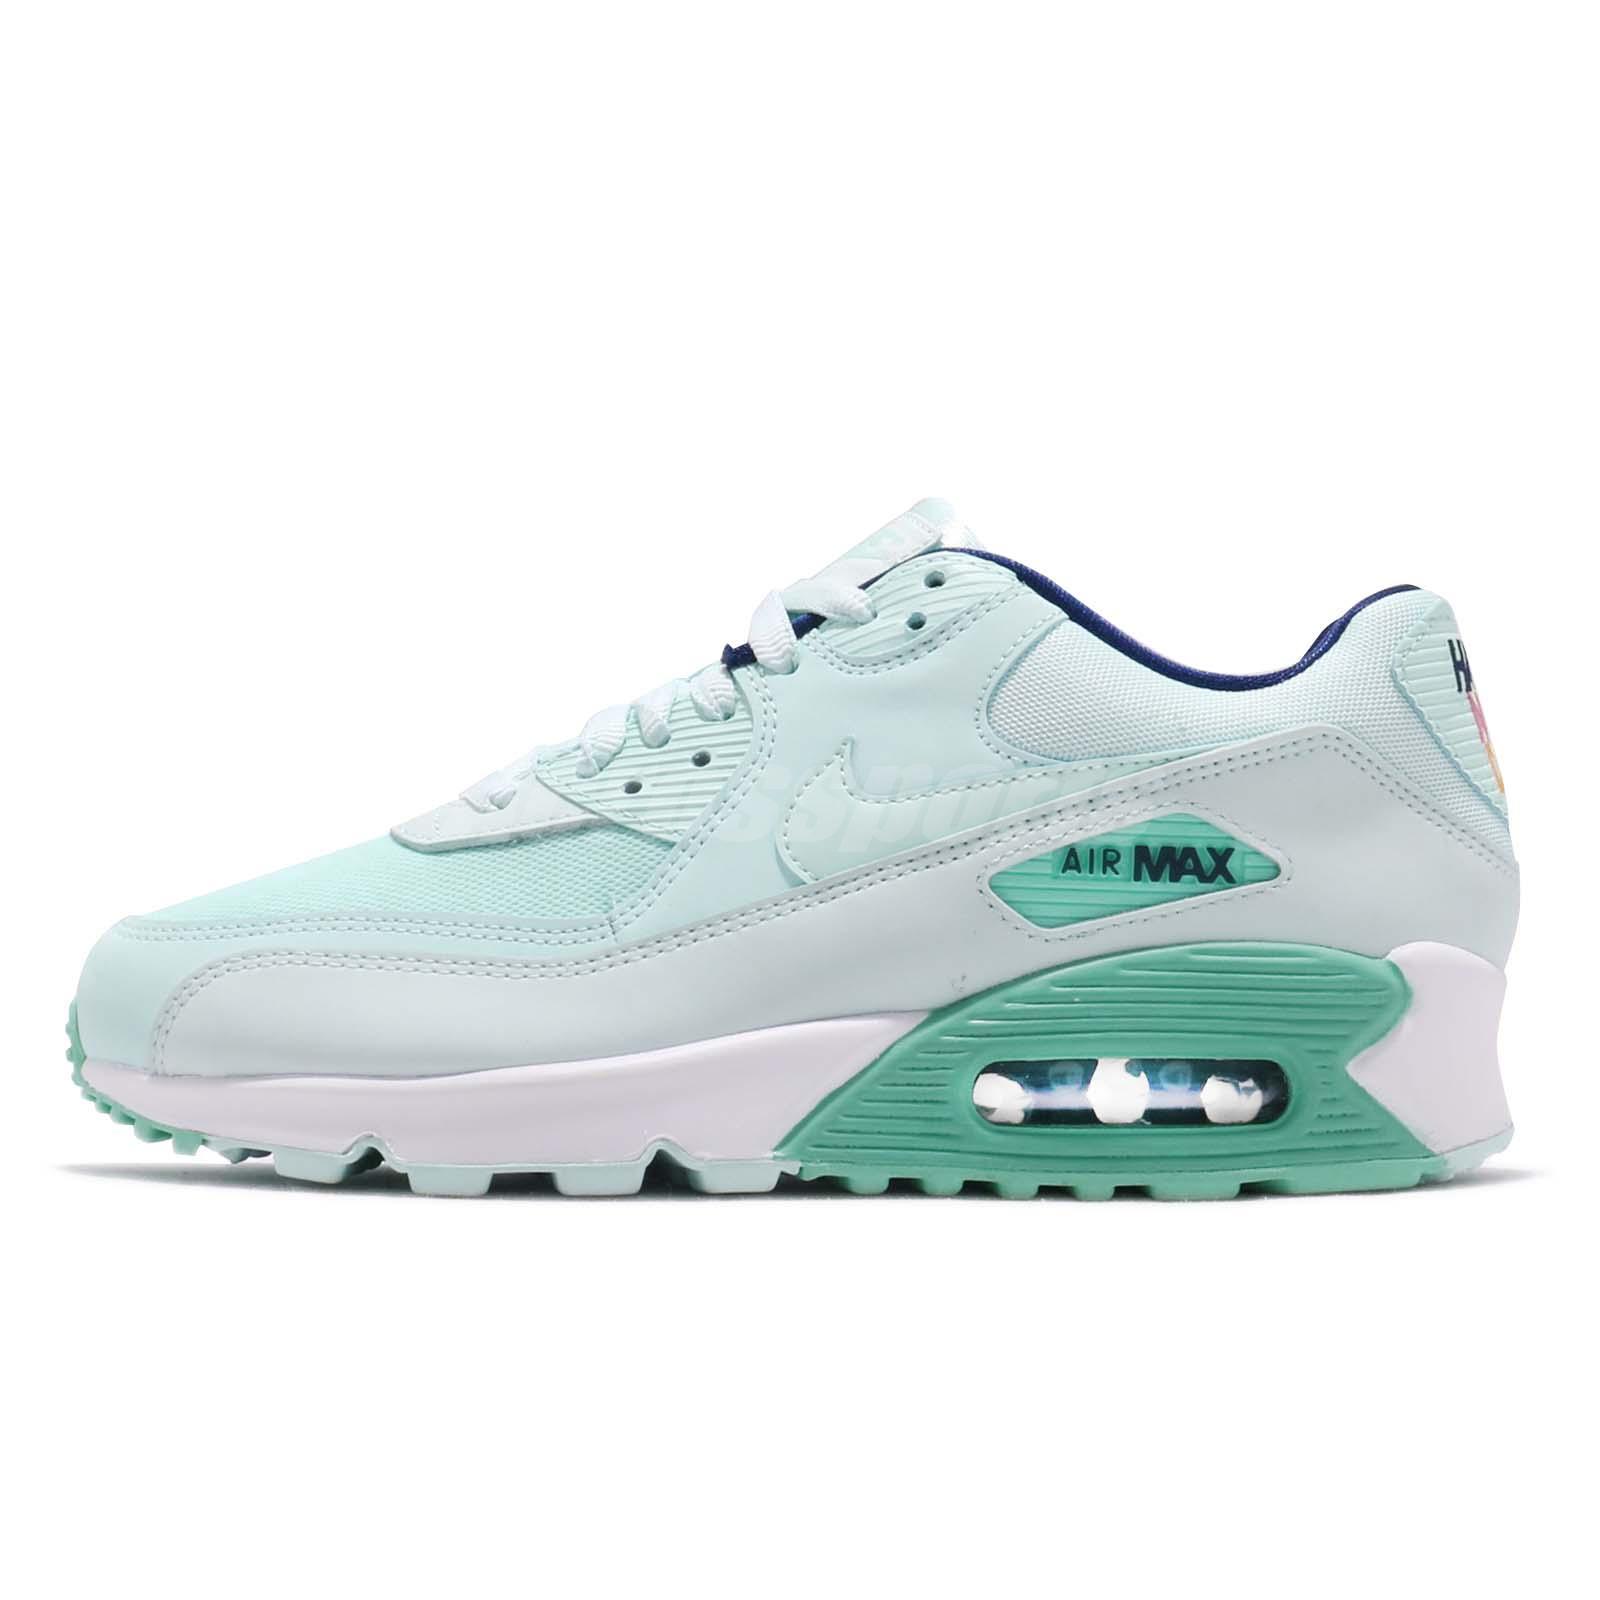 Detalles acerca de Nike Wmns Air Max 90 se Verde Azulado Tinte Verde Blanco Mujeres Tenis para Correr 881105 301 mostrar título original